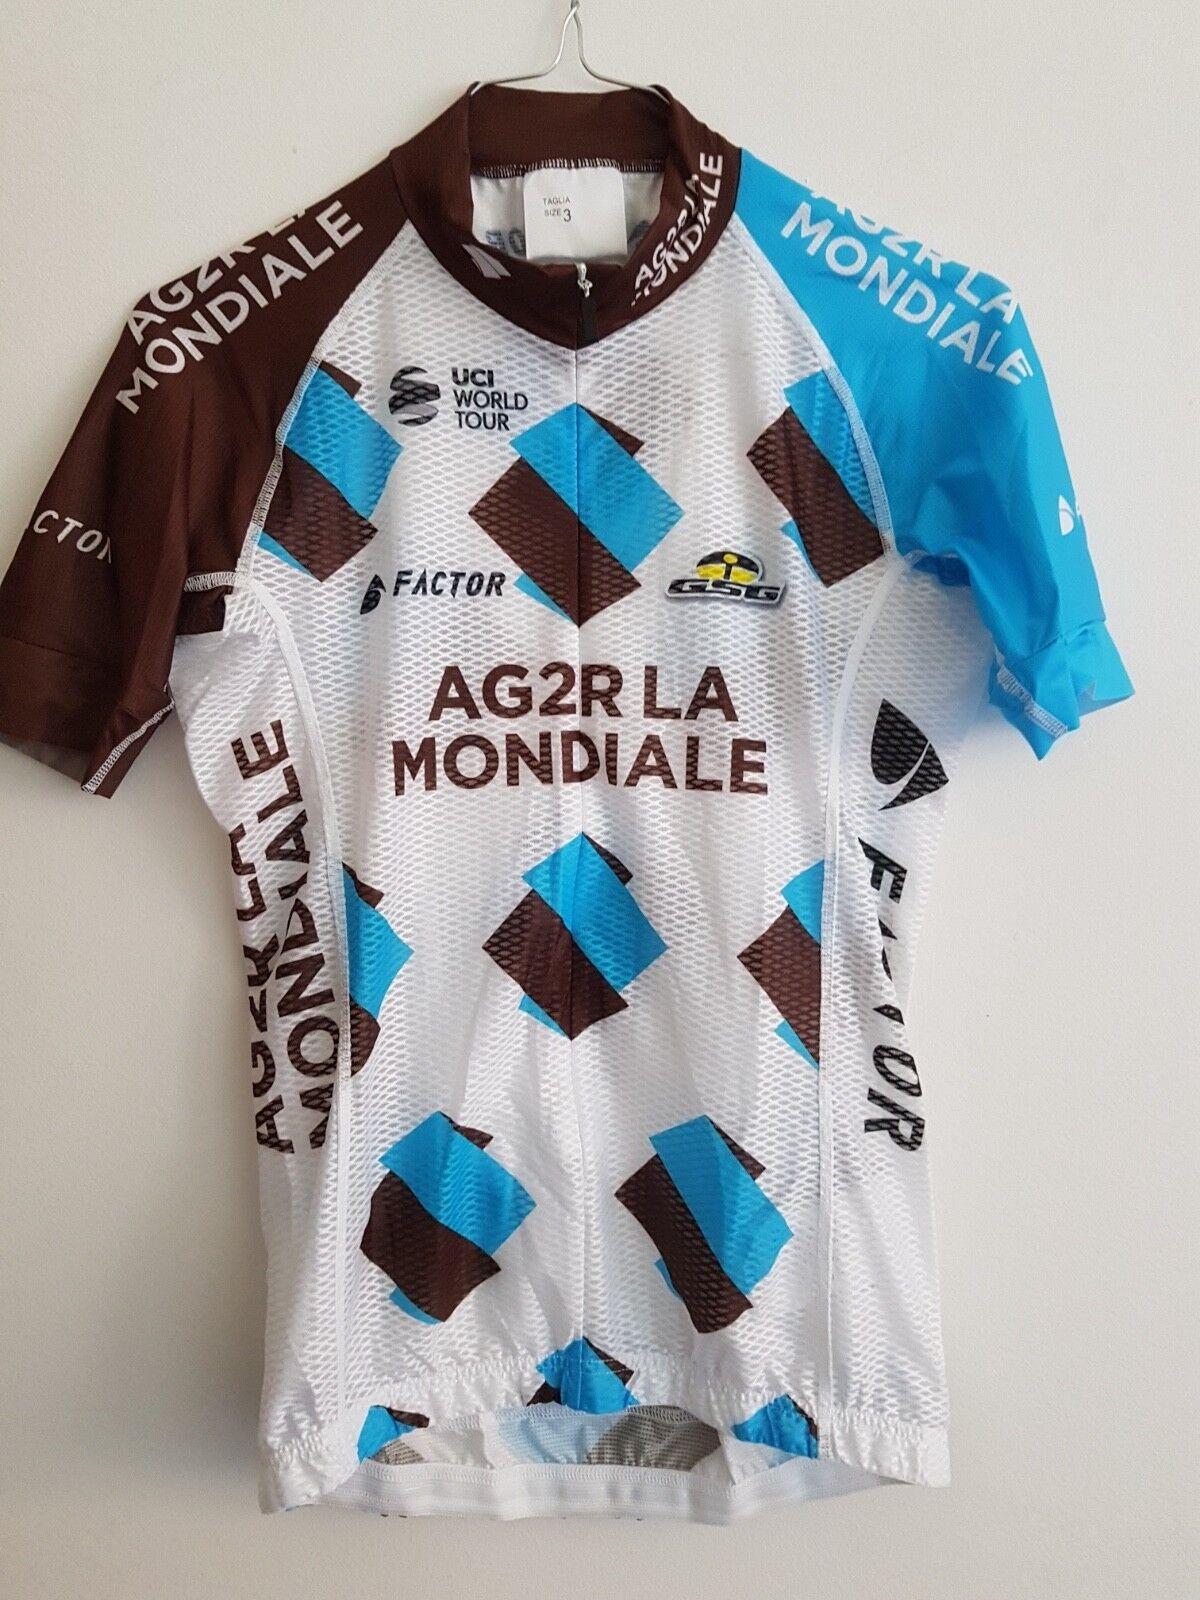 Maillot cycliste vélo BARBIER cyclisme tour de france jersey cycling jersey france radtrikot b7c122